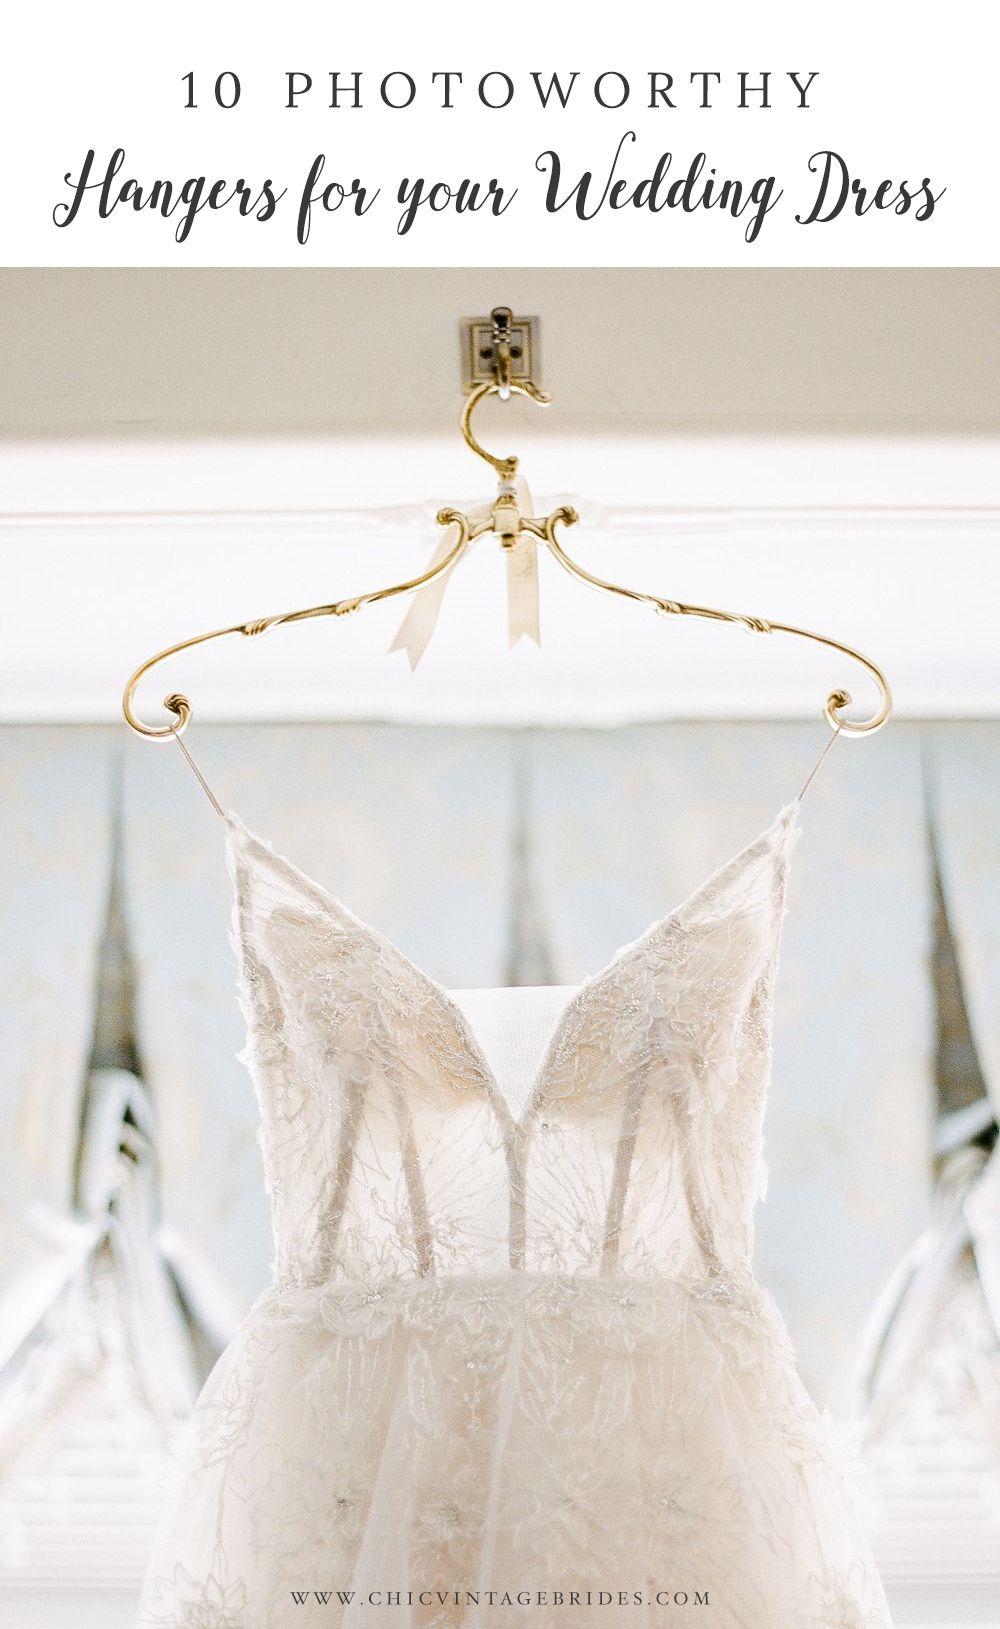 10 Beautiful Wedding Dress Hangers Wedding Dress Hanger Wedding Gown Hangers Dress Hanger